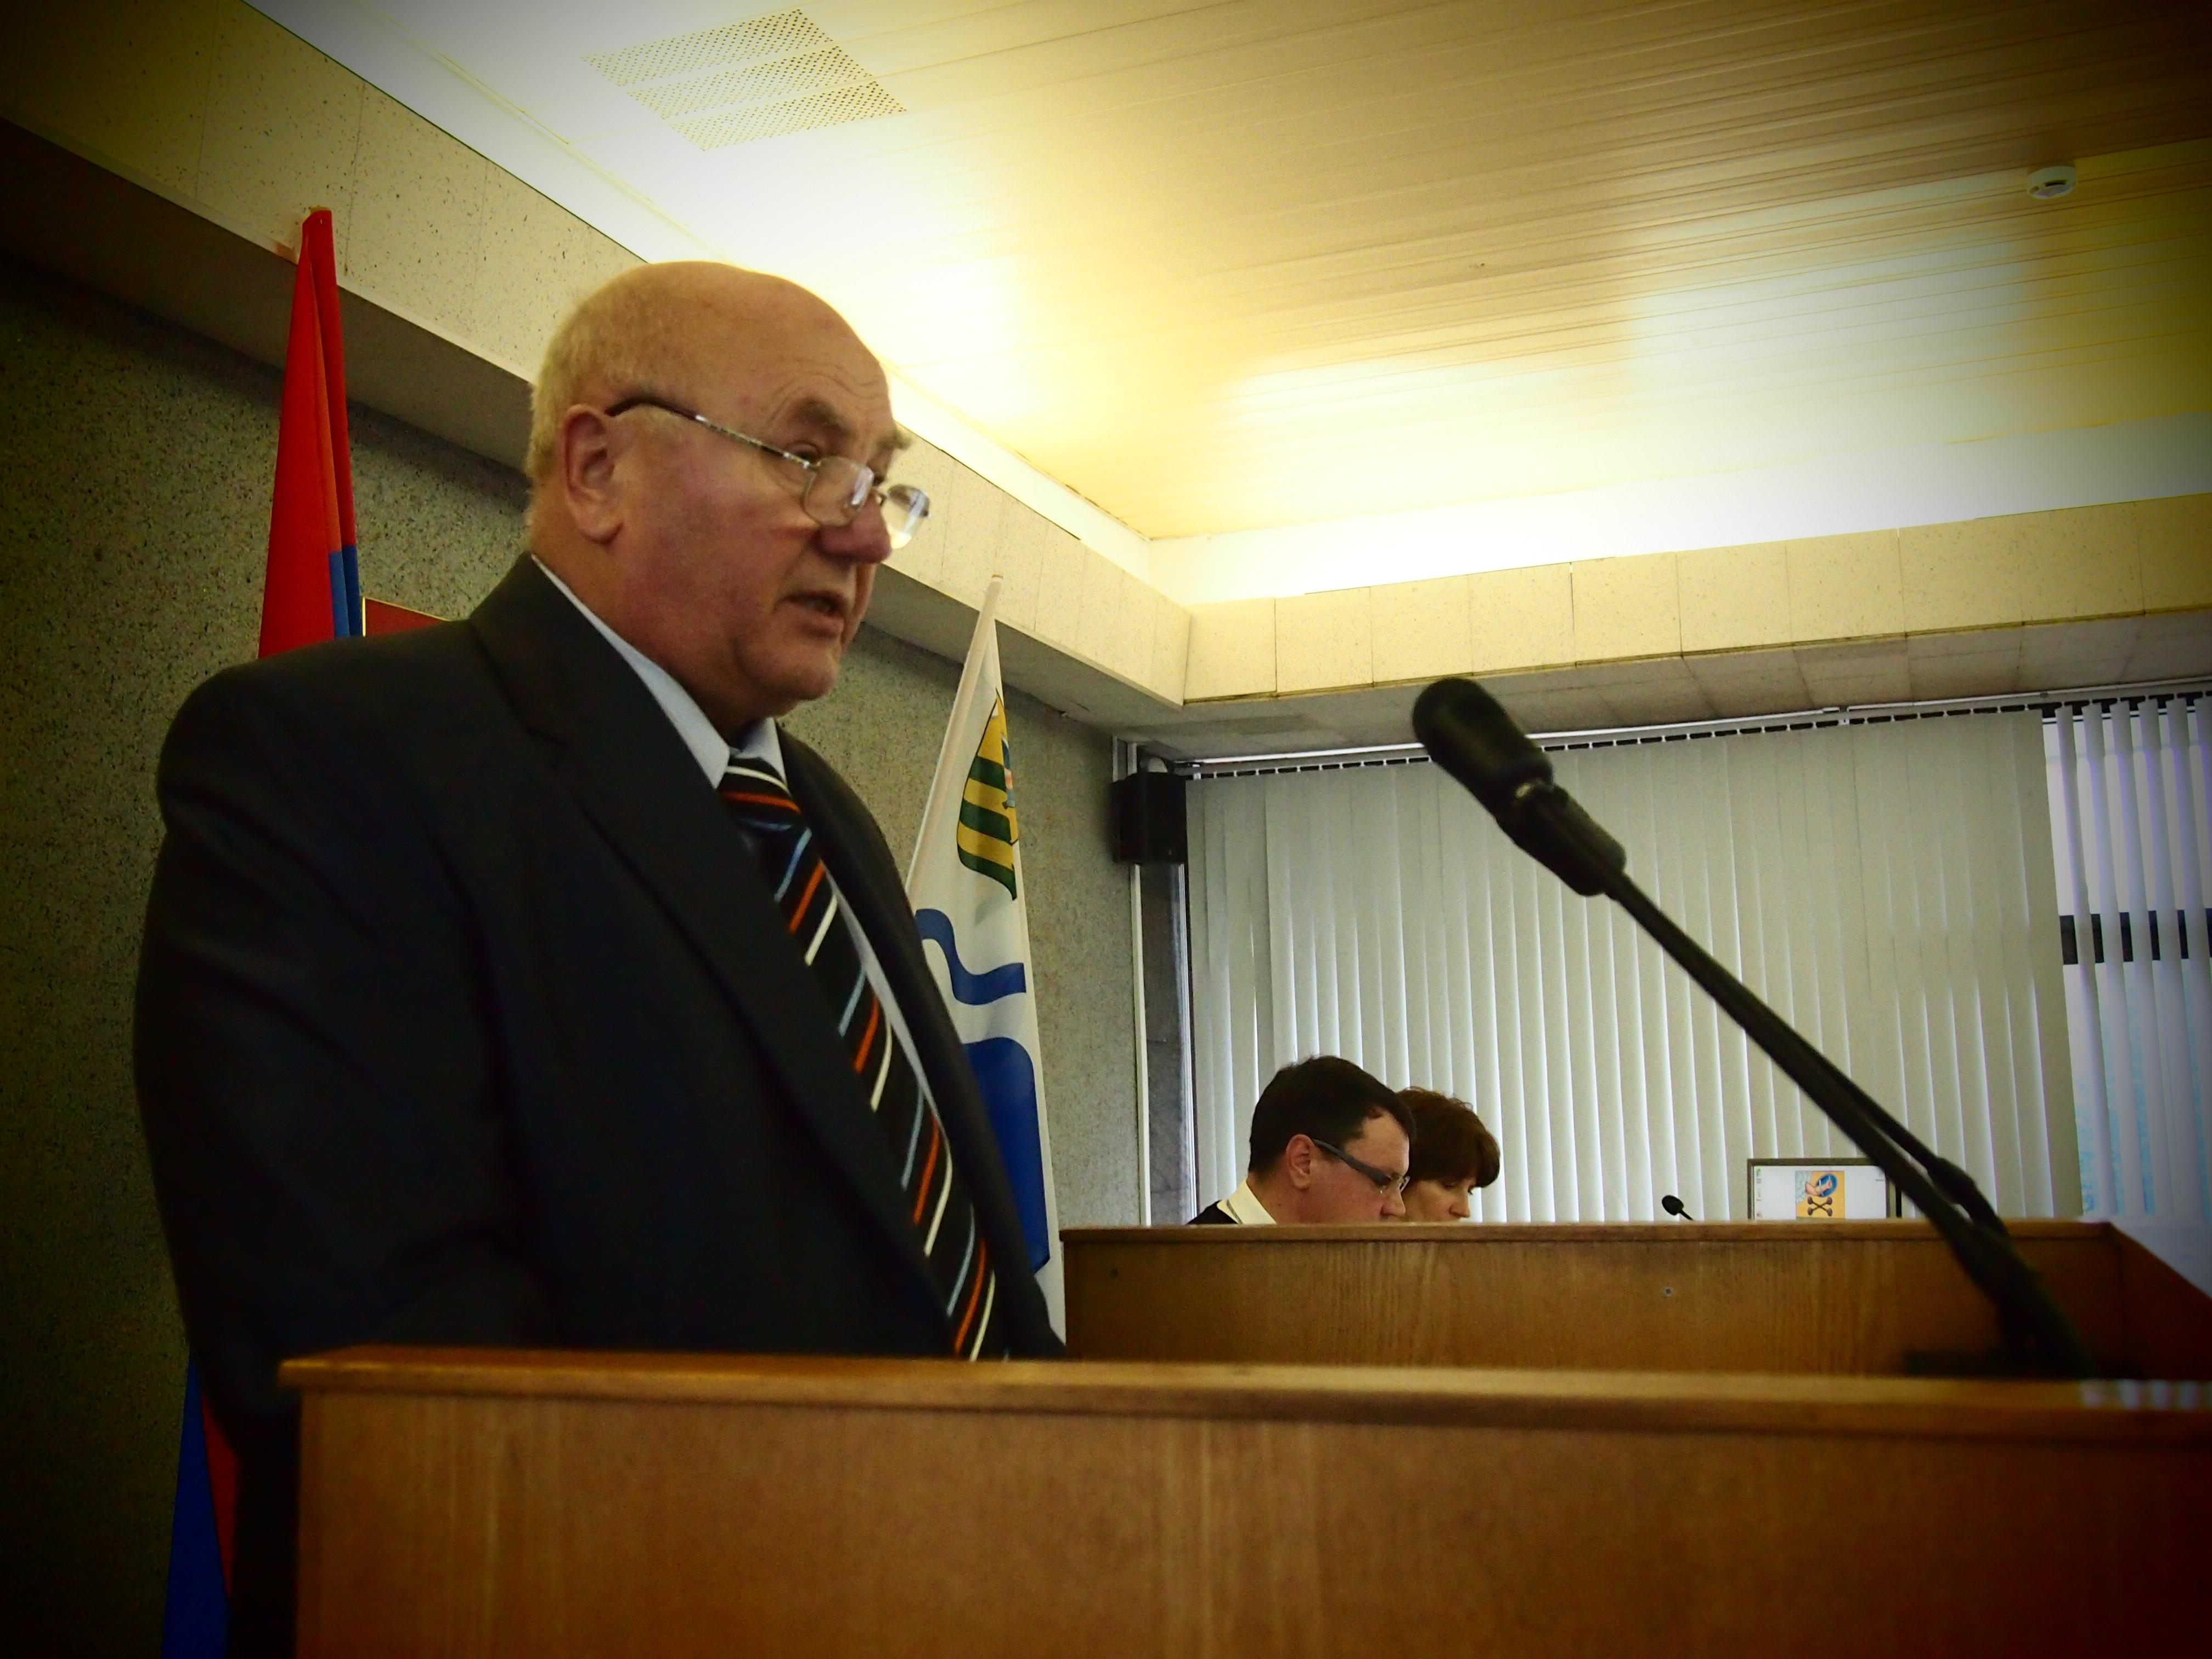 Генерал-майор запаса Стефан Борисов. Фото: Валерий Поташов